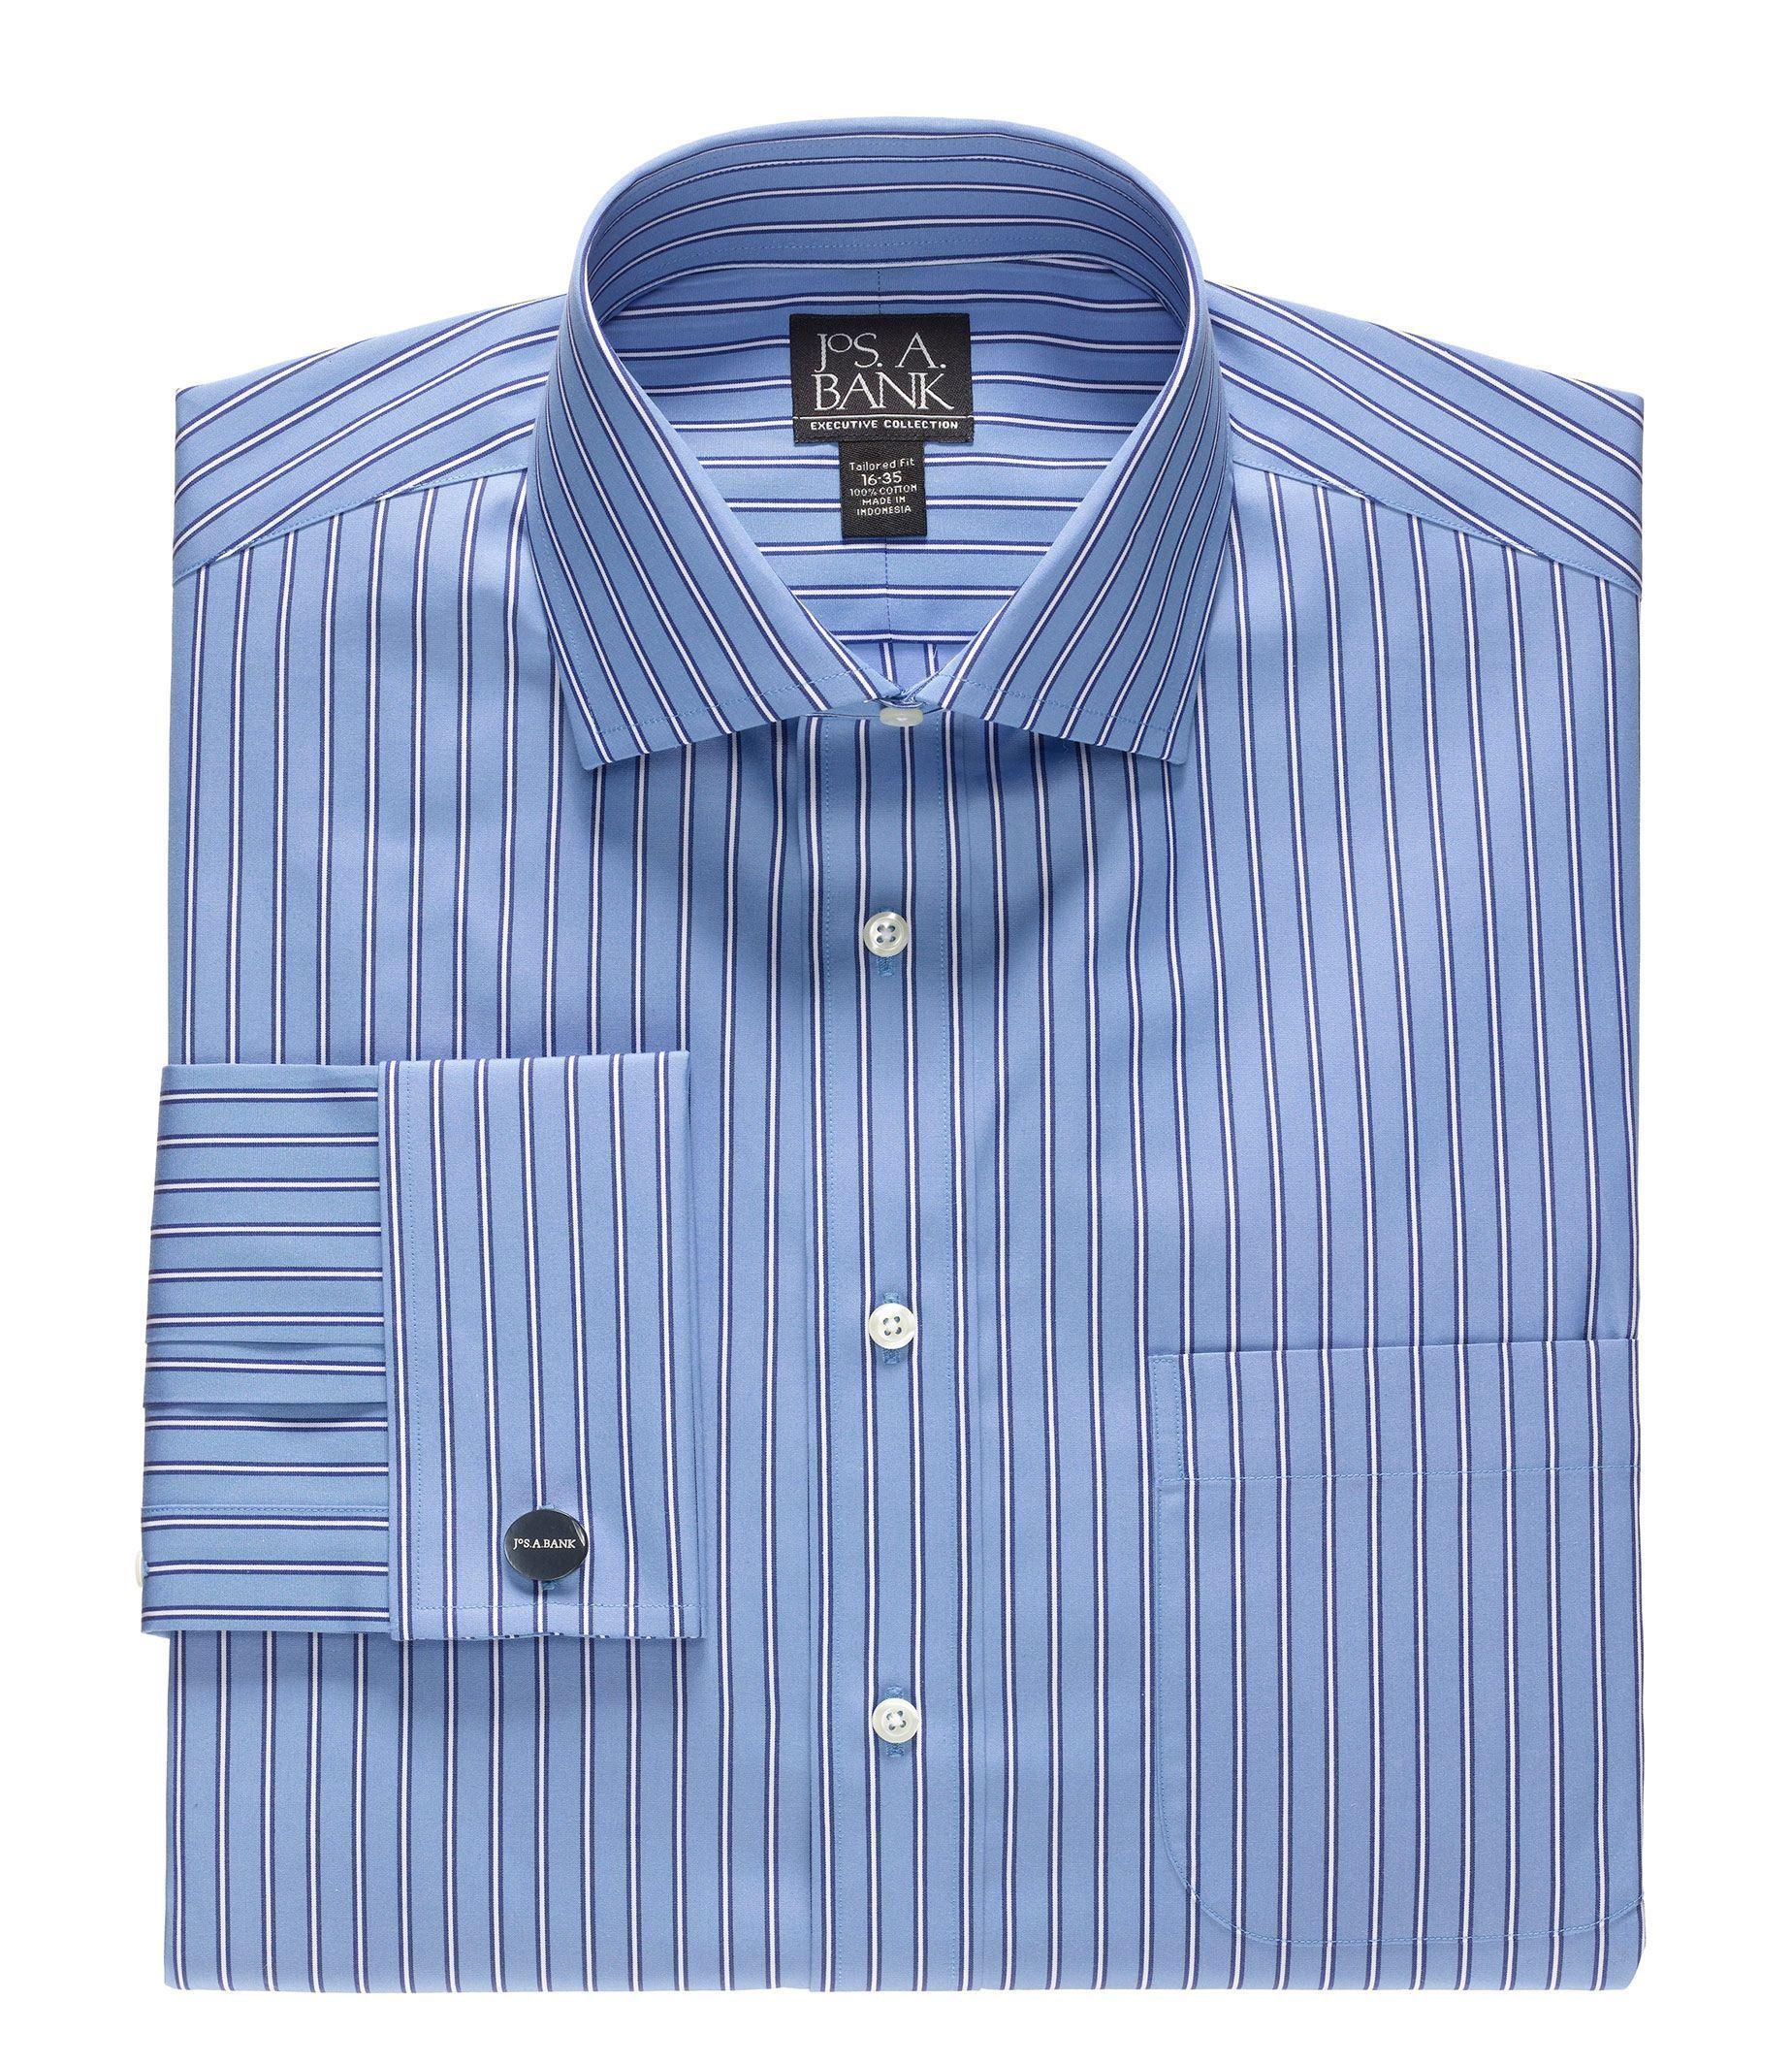 47d20496360 Macys Mens Dress Shirts Clearance